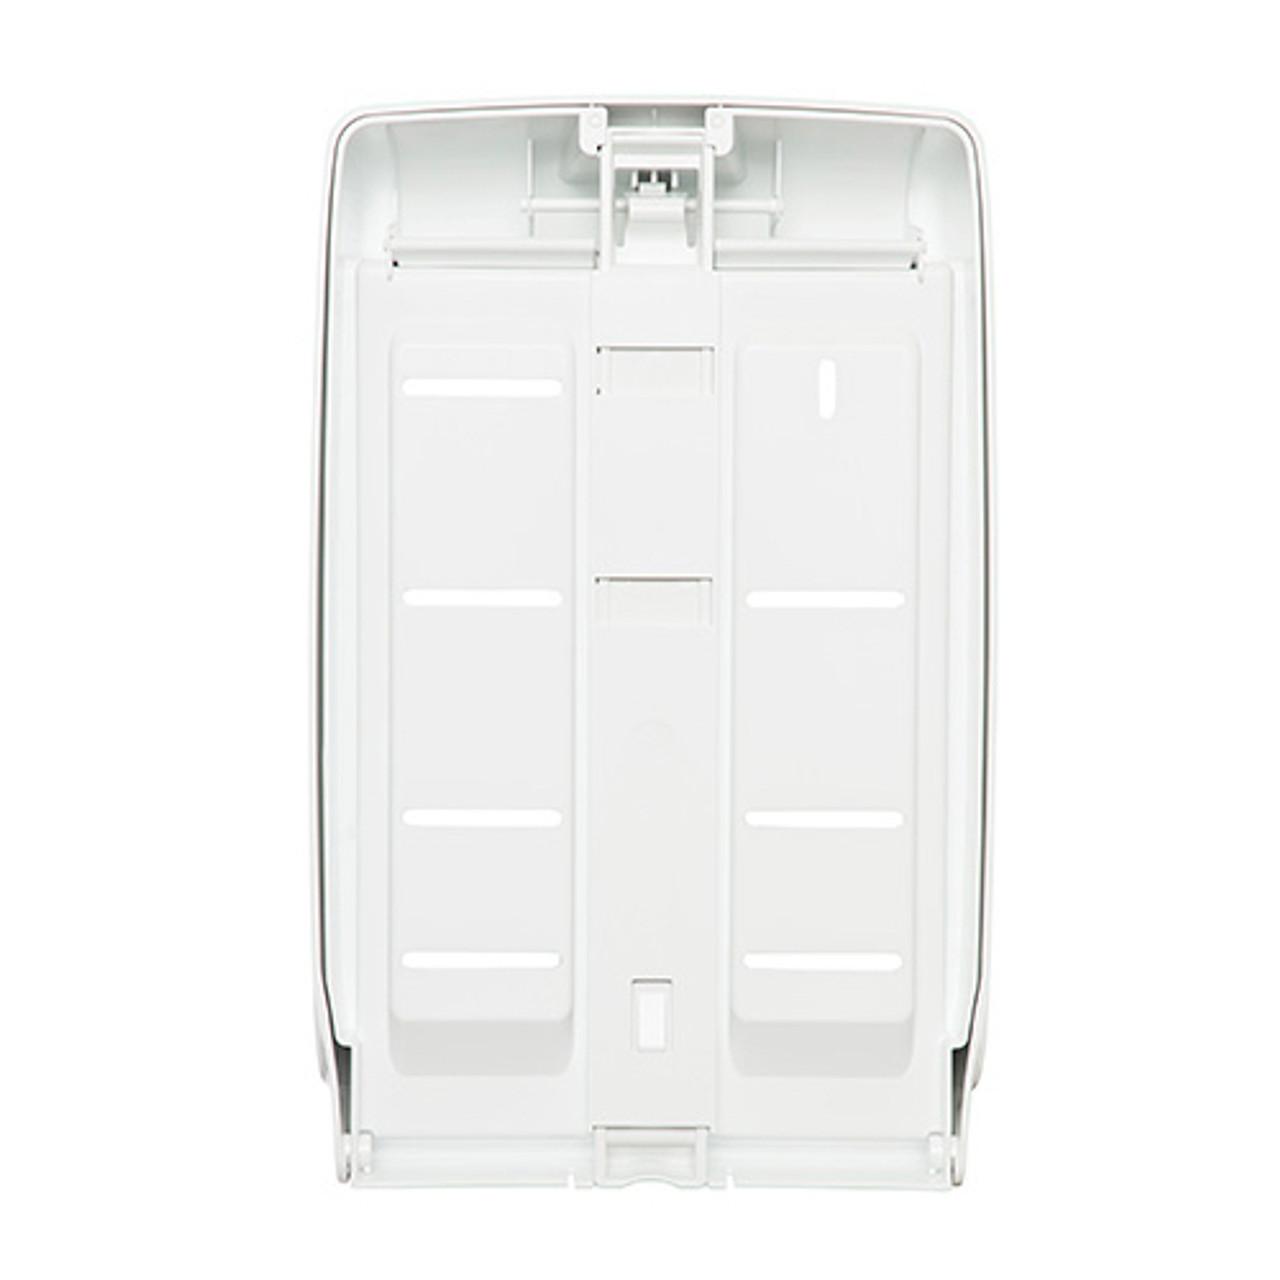 Kimberly Clark Aquarius Compact Hand Towel Dispenser (70240) Kimberly Clark Professional